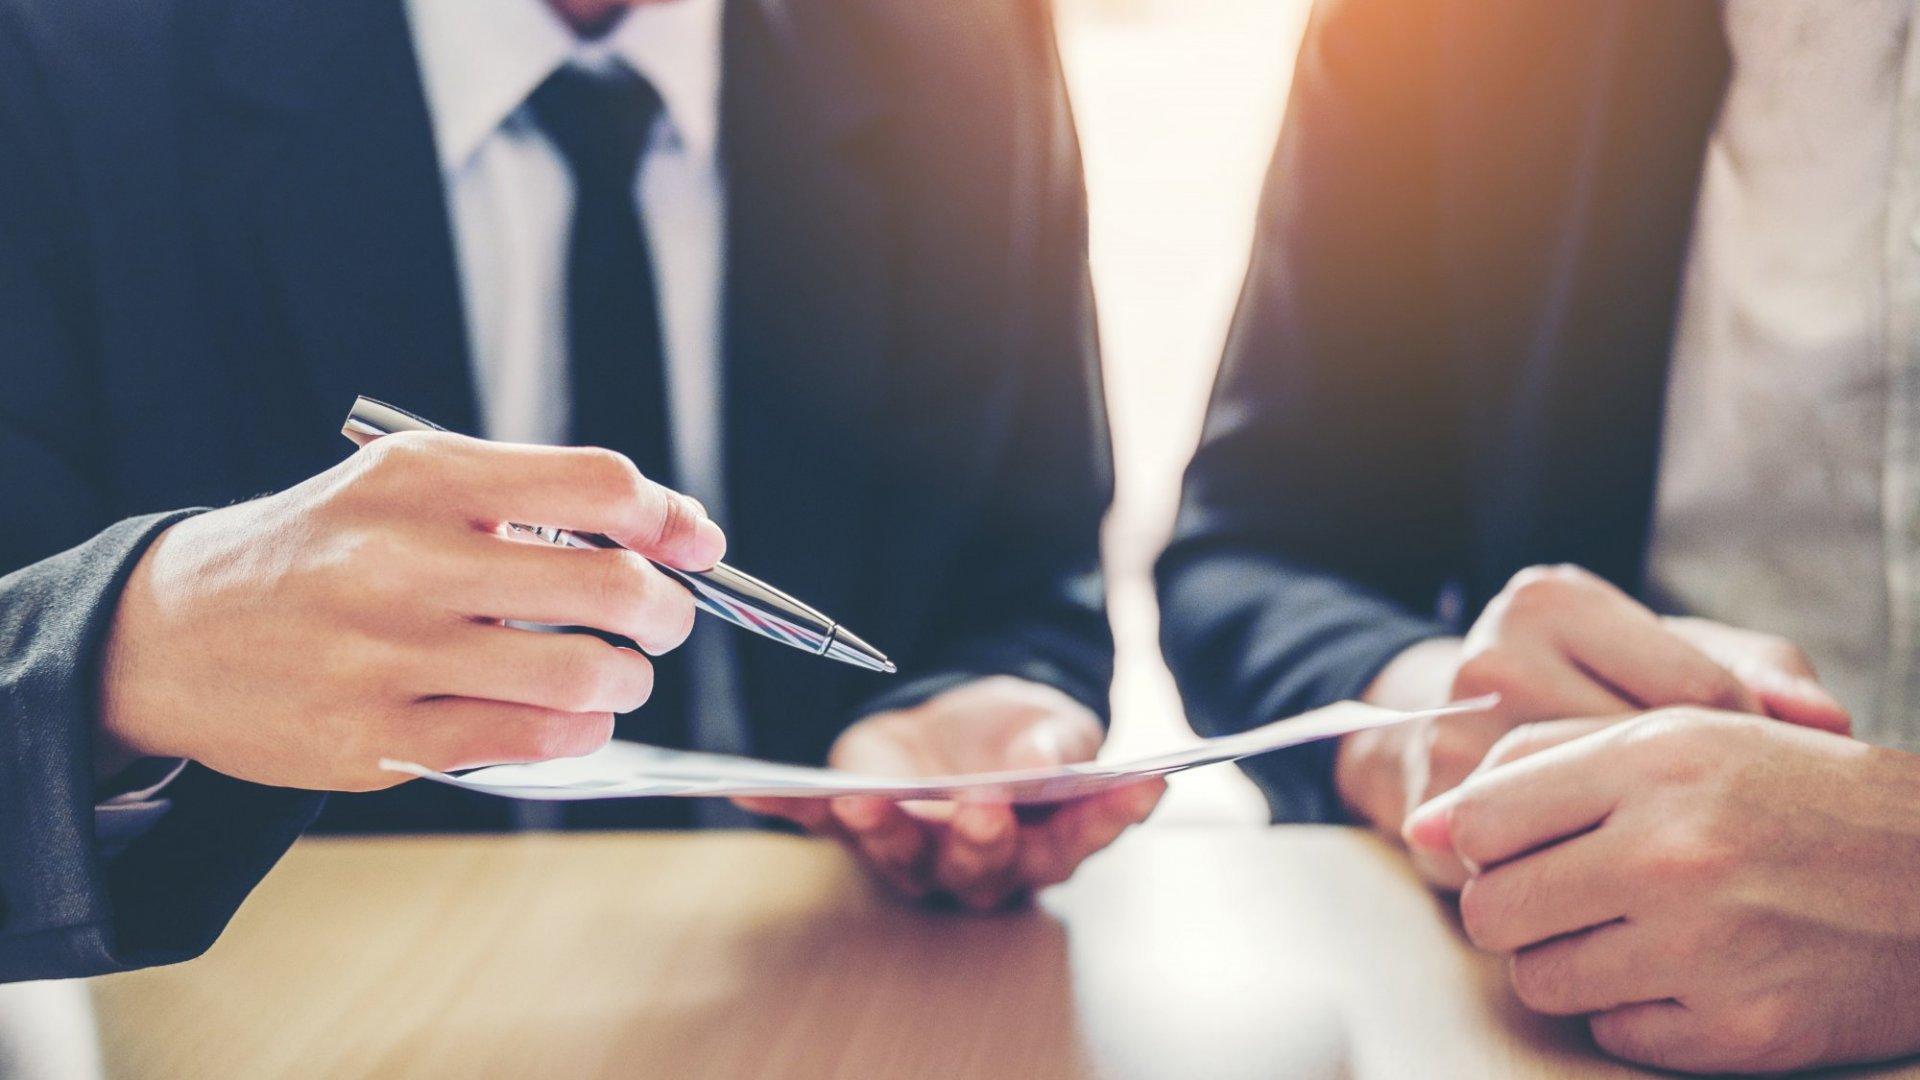 5 Ways Cosigning a Loan May Hurt You Financially